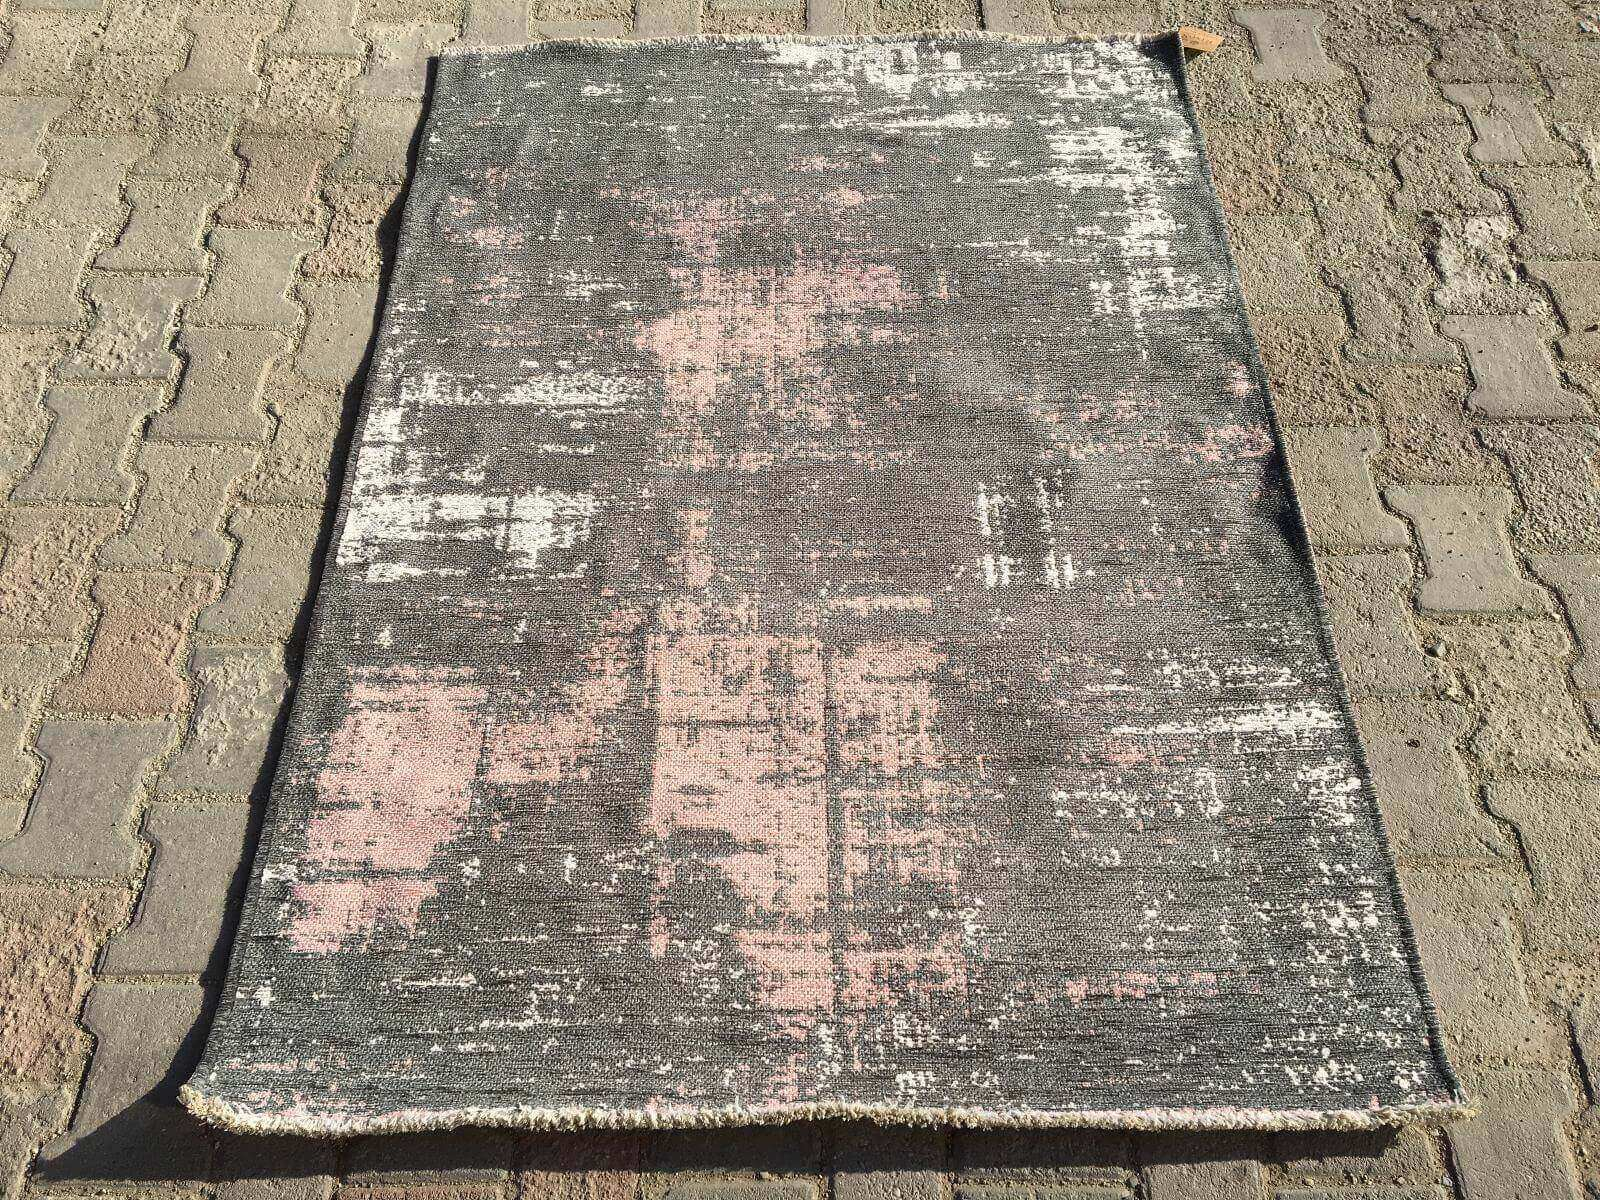 COTTON LÜX KİLİM GRİ PUDRA 120X180 Cotton Lux Kilim Dekoratif Kilim